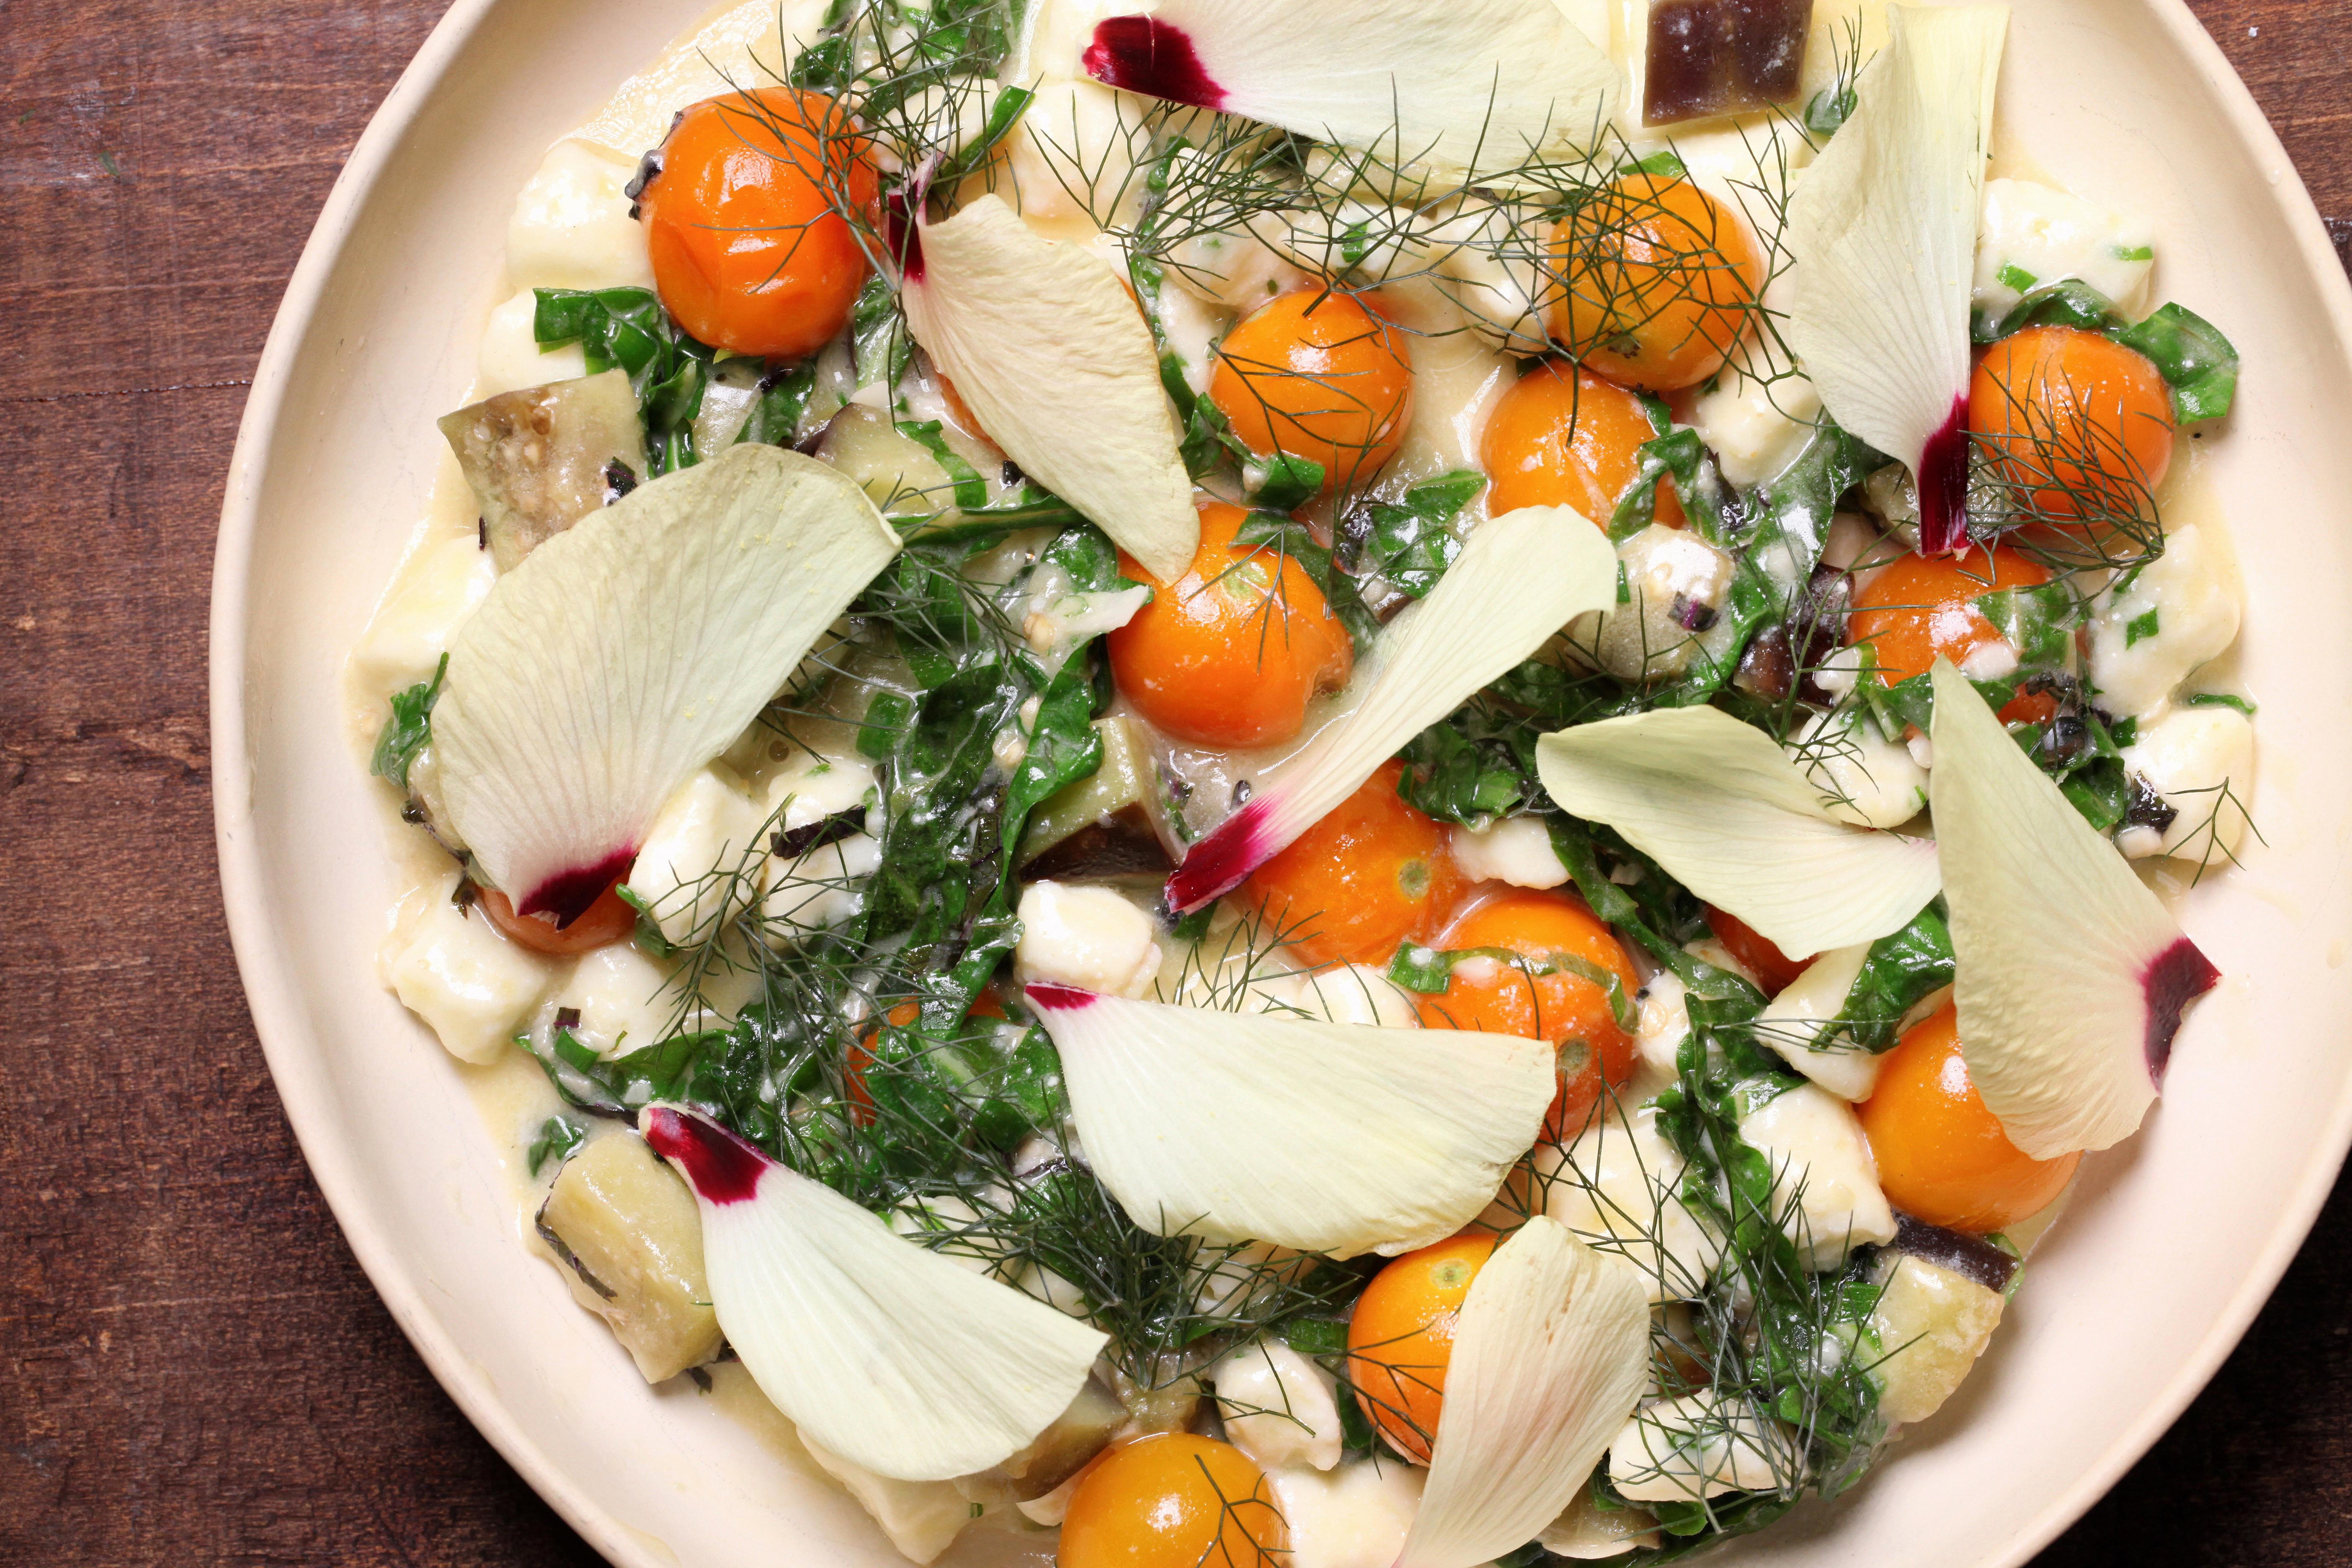 1573163170772-IMG_5540-ricotta-gnocchi-tomatoes-vegetables-chef-nick-elmi-laurel-philadelphia